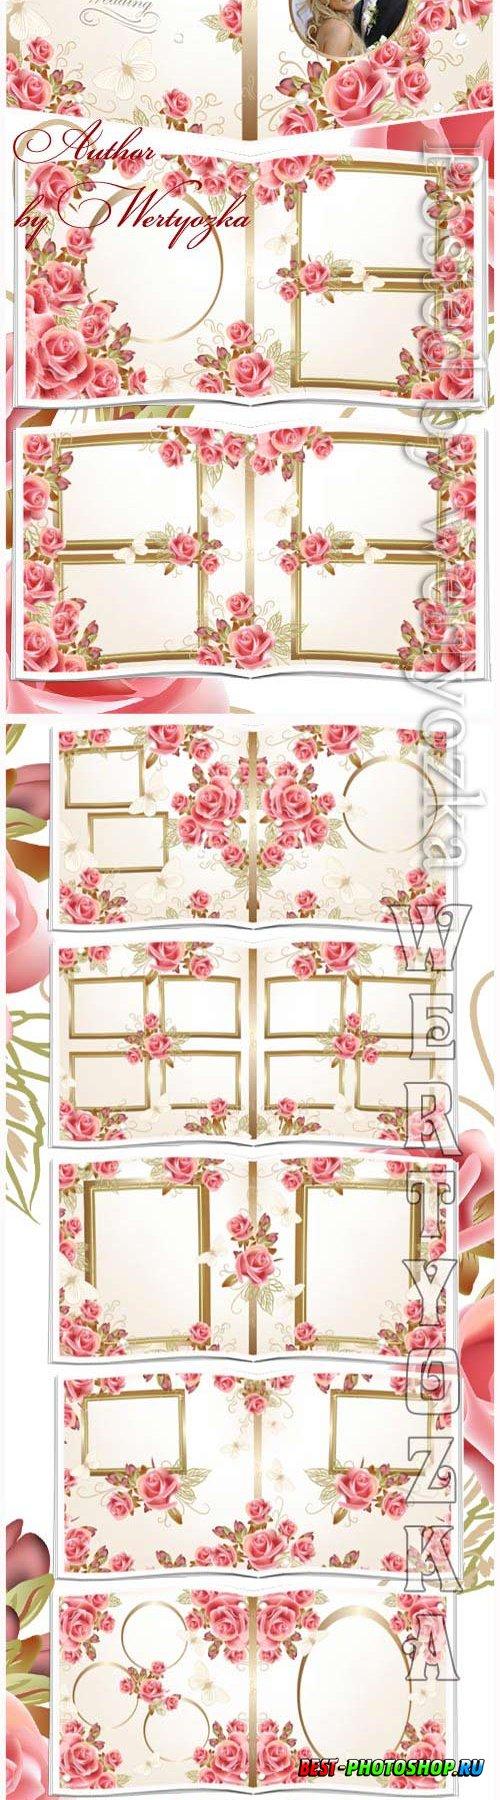 Beautiful photo album with roses